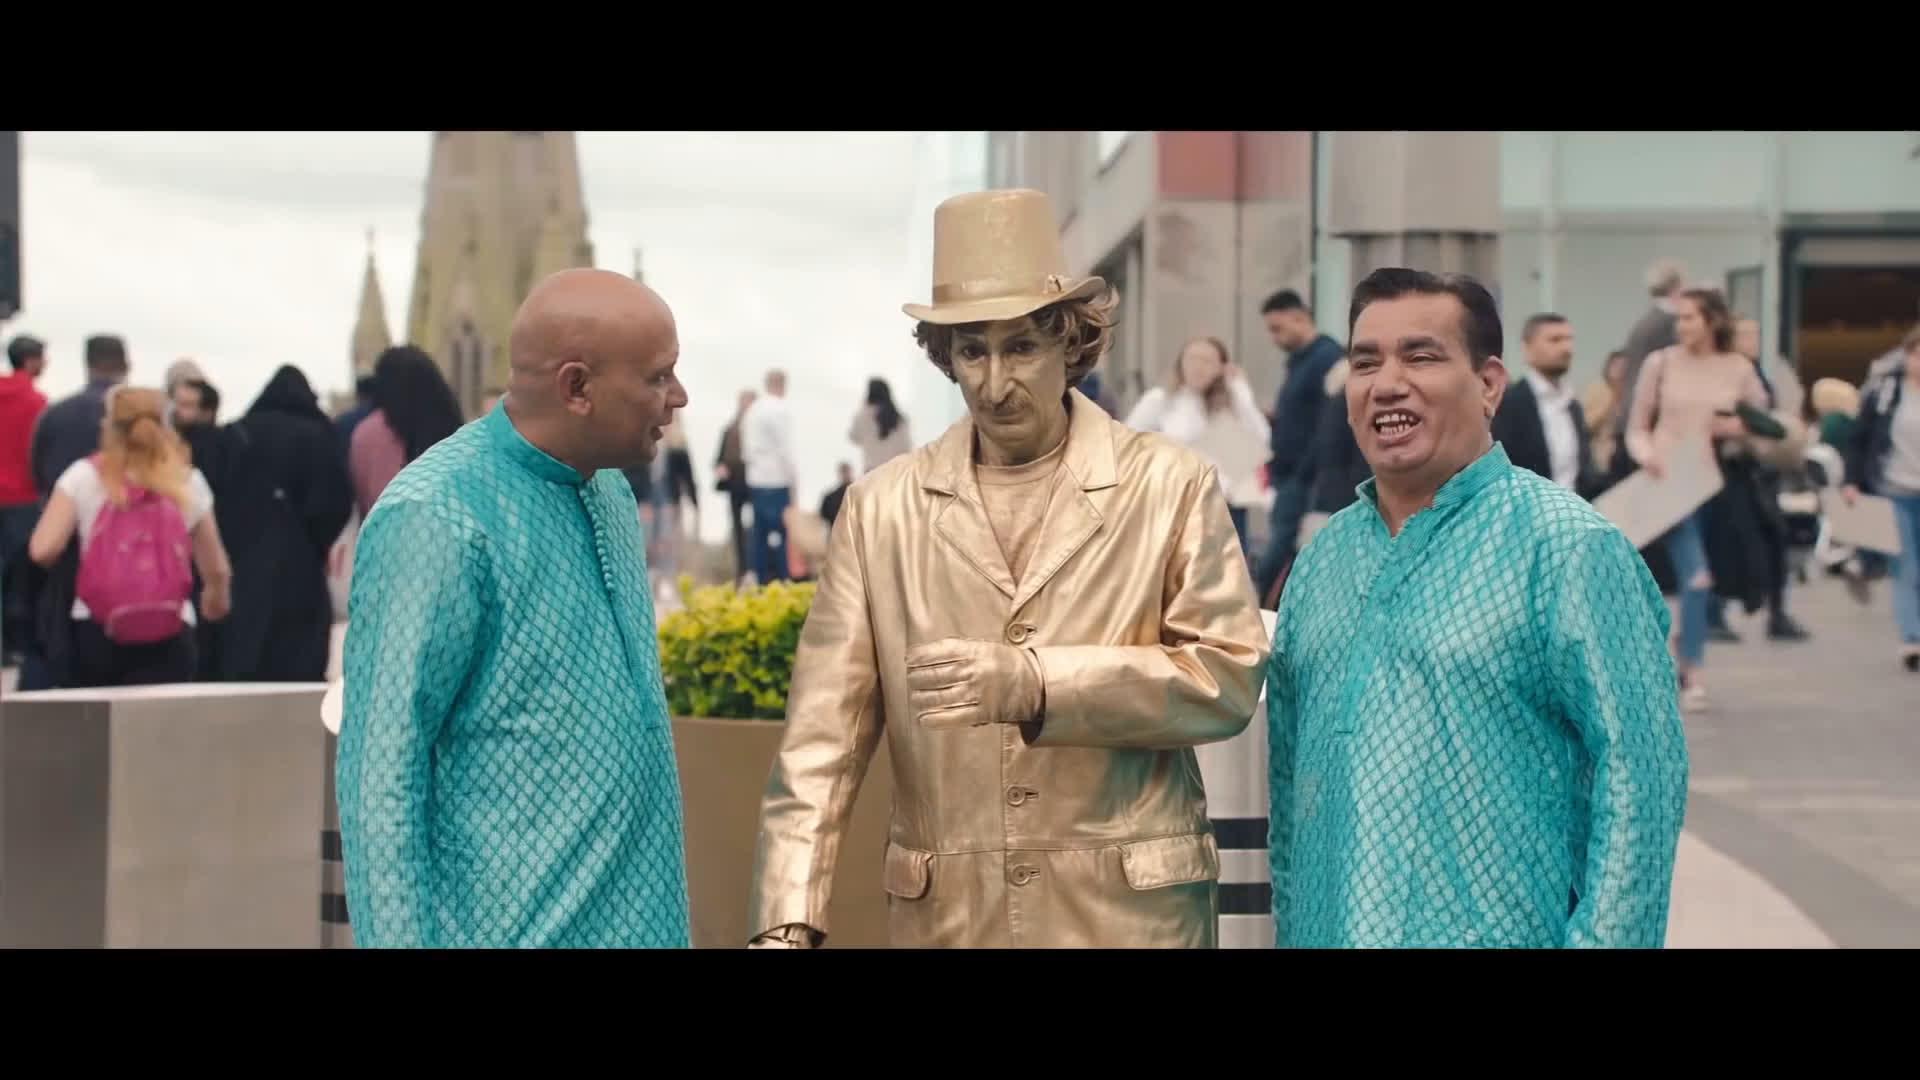 Chal Mera Putt 2 Full Movie Watch Online Free Streaming